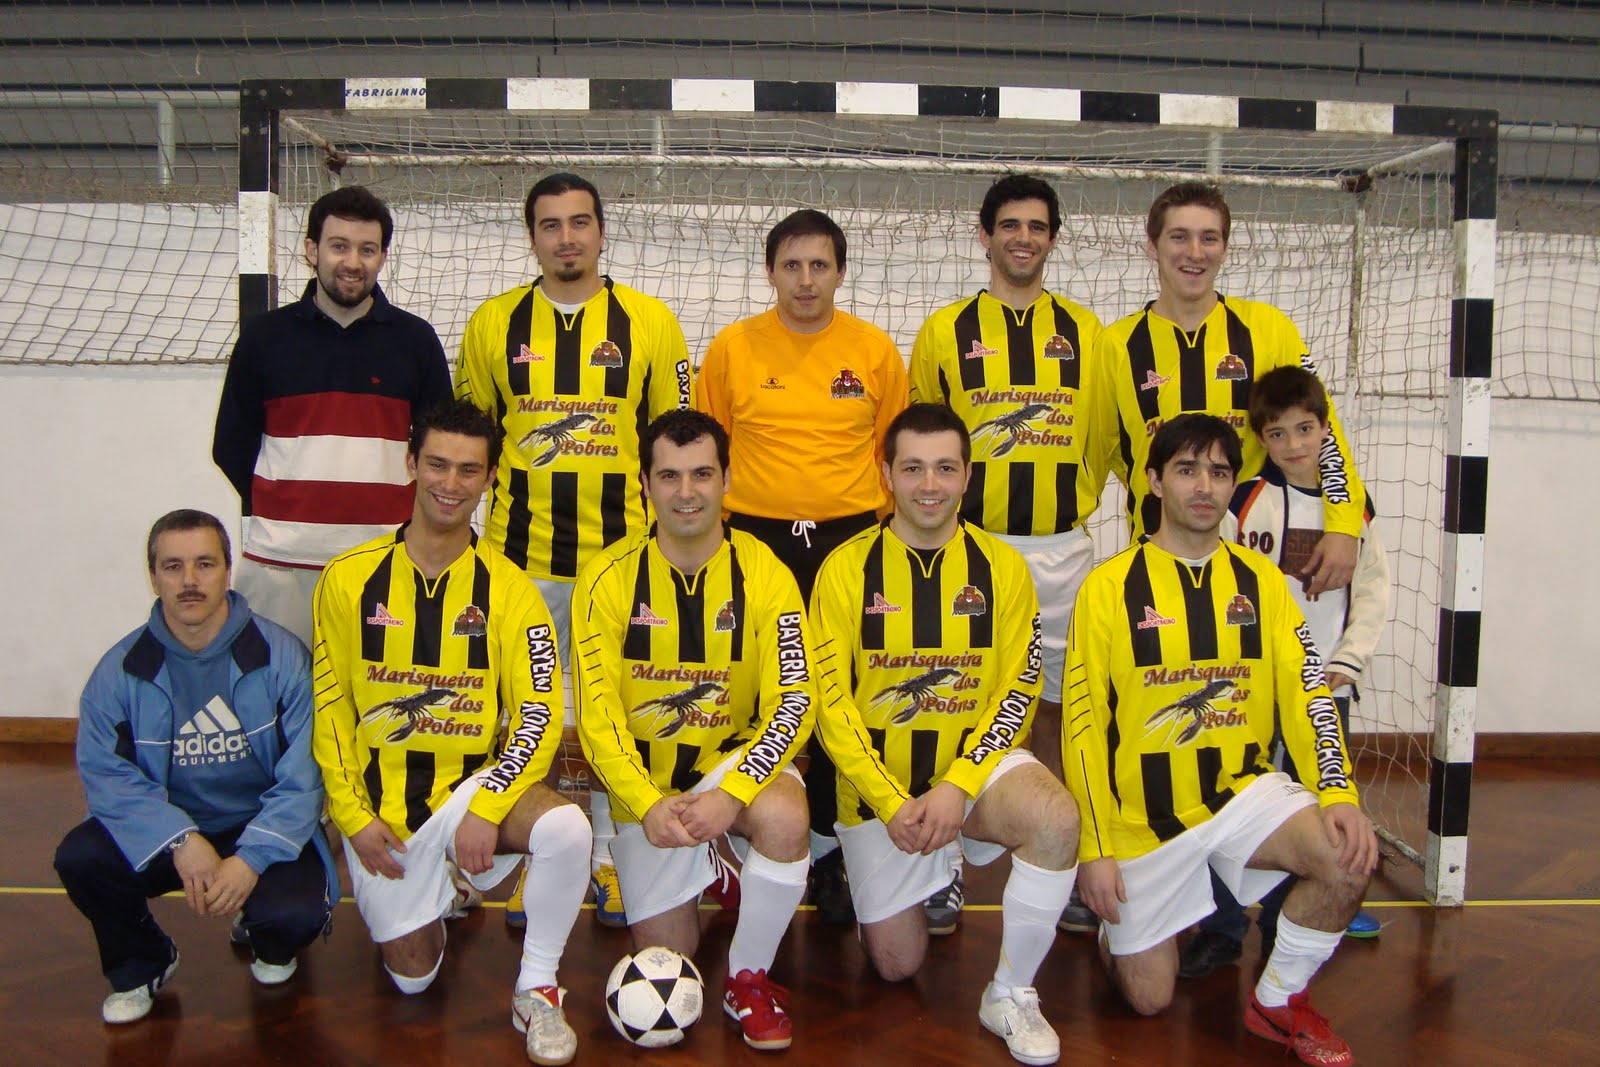 VENCEDOR DA TAÇA FutBaliense 2008/09